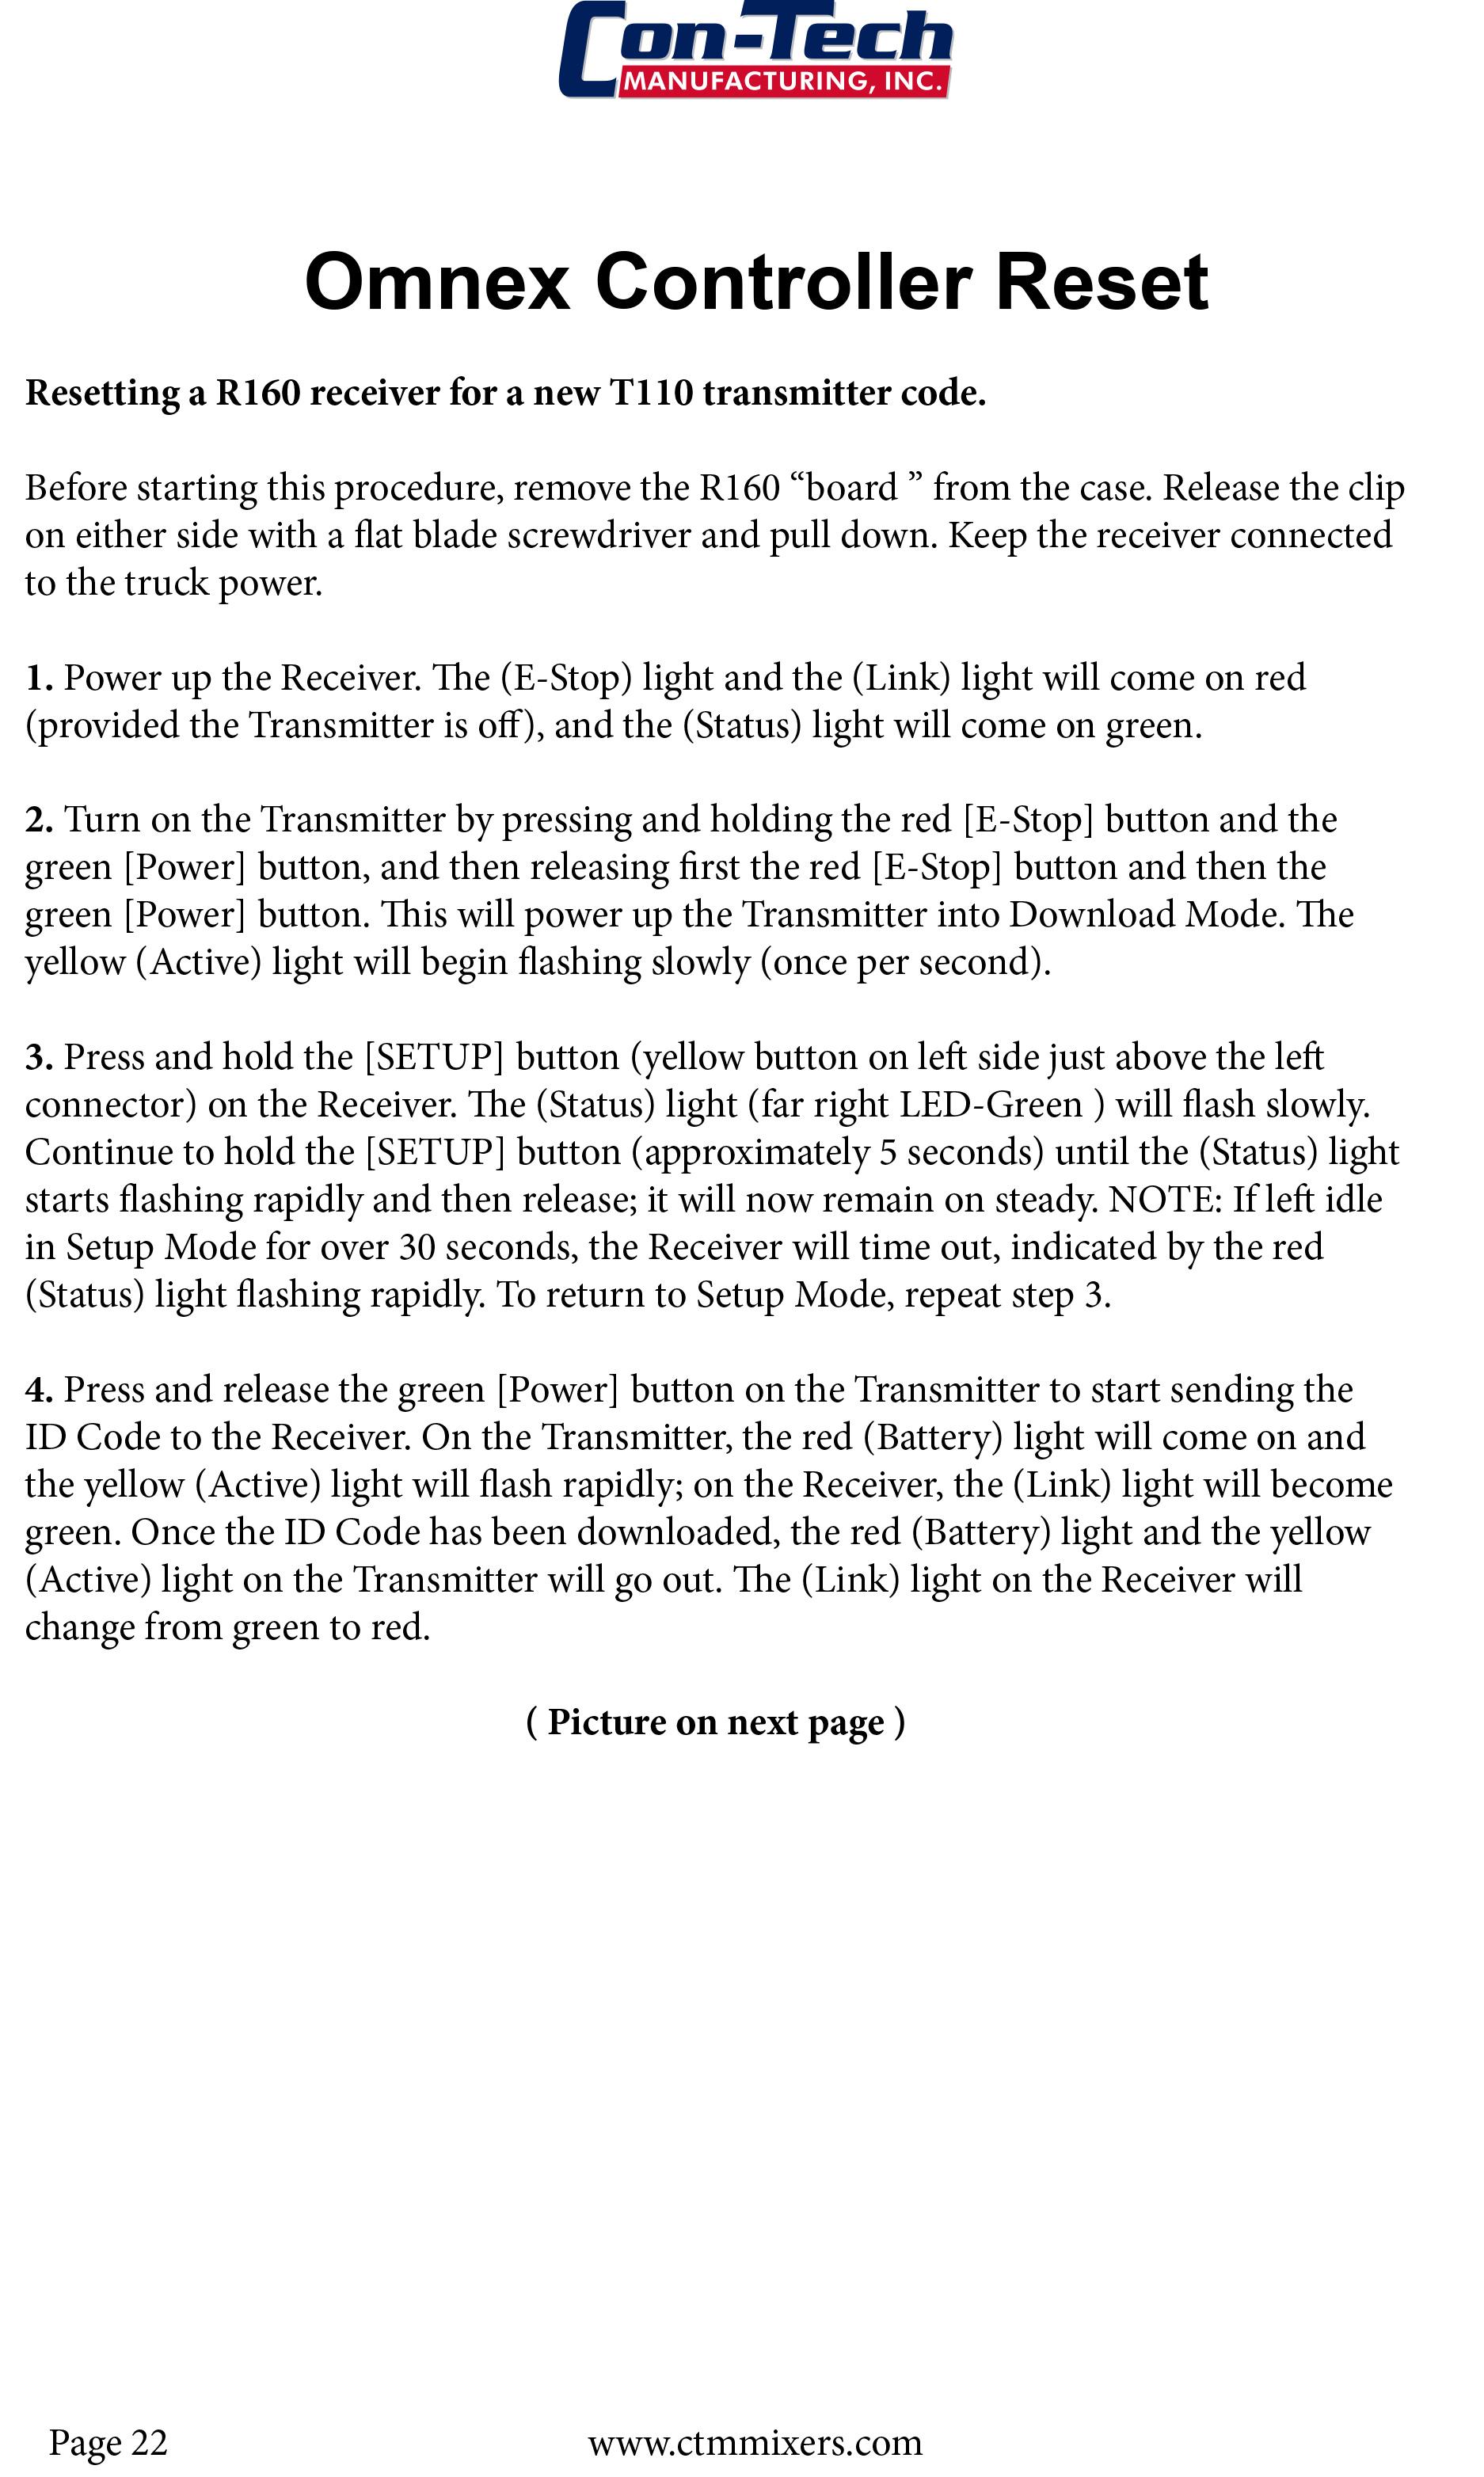 omnex-pairing-instructions.jpg